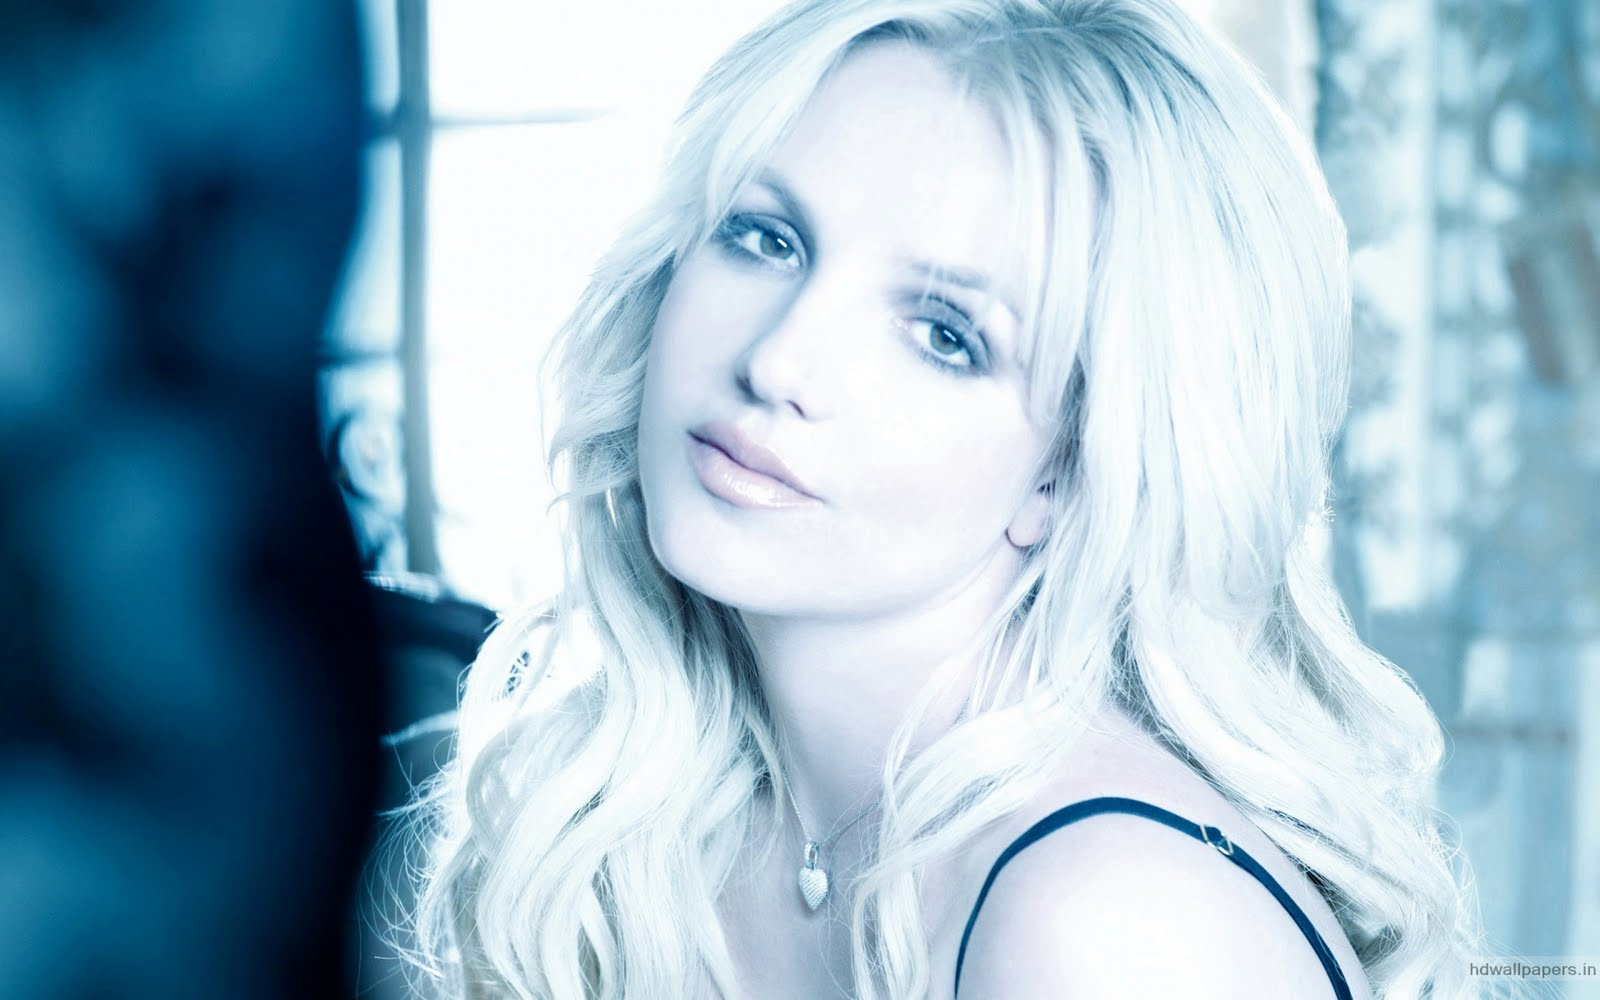 http://2.bp.blogspot.com/-3y_oPmVnYPI/TmI4Bqj3kNI/AAAAAAAACbo/ydsYir2Ehxc/s1600/Britney+Spears+2011+Pictures.jpg